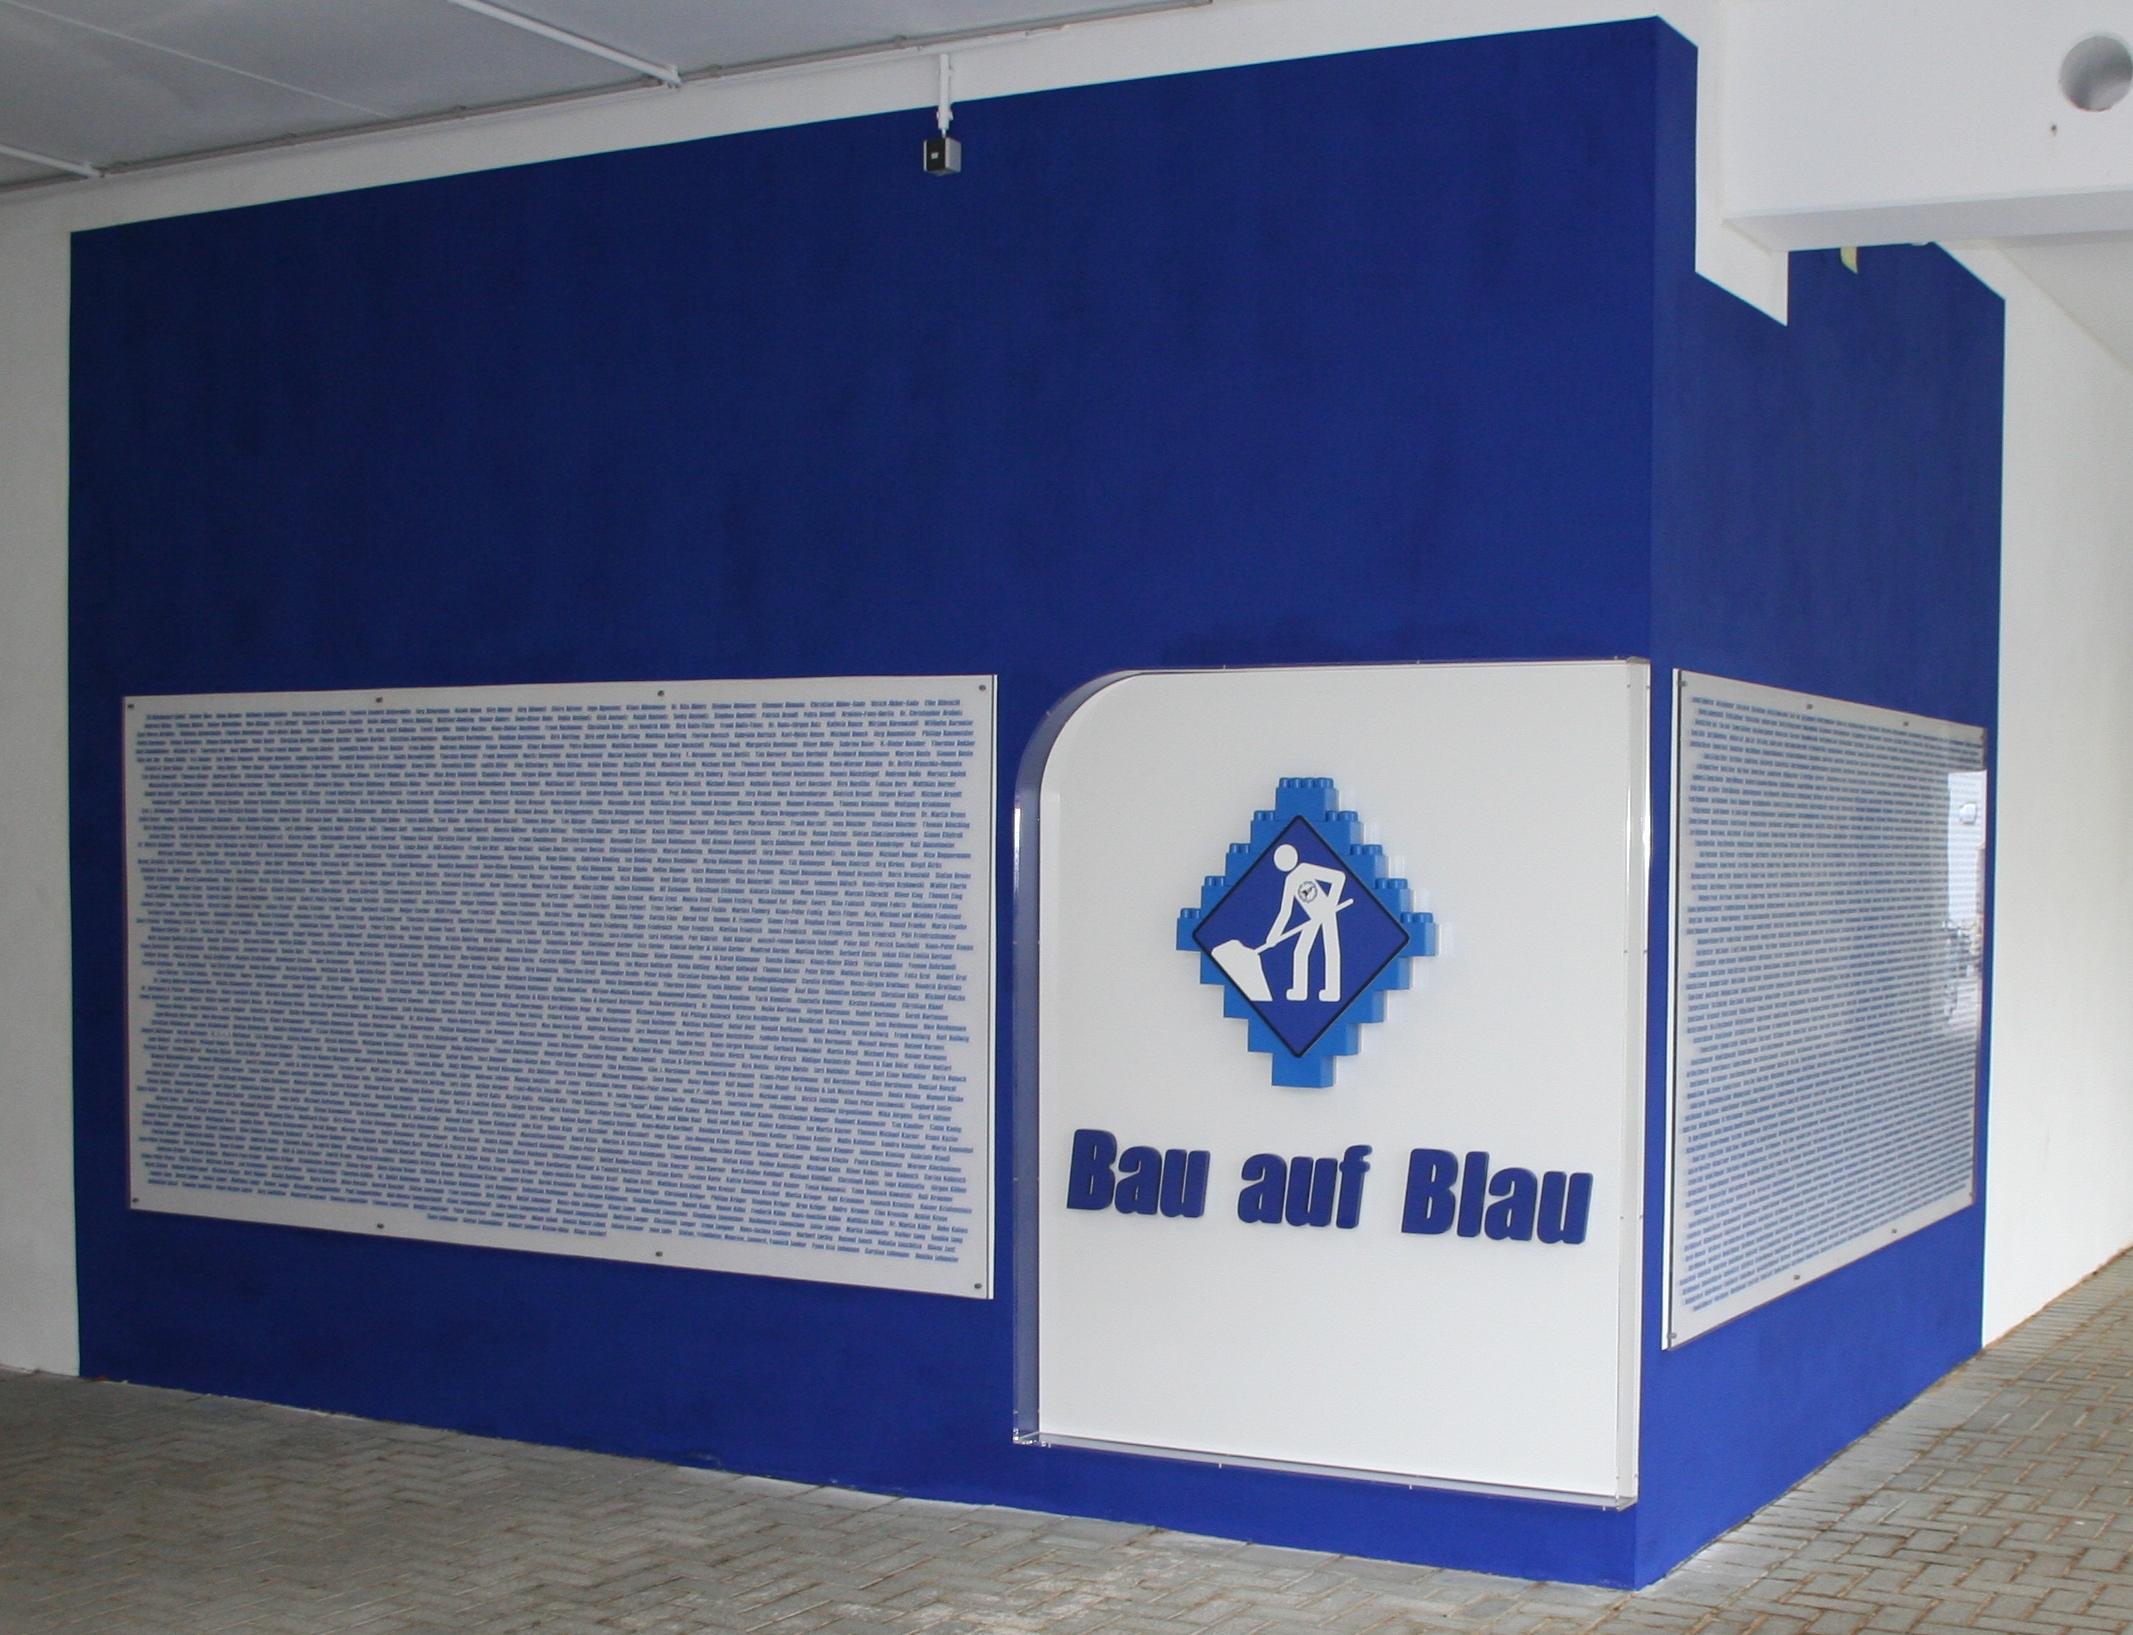 File:Blaue Wand.JPG - Wikimedia Commons